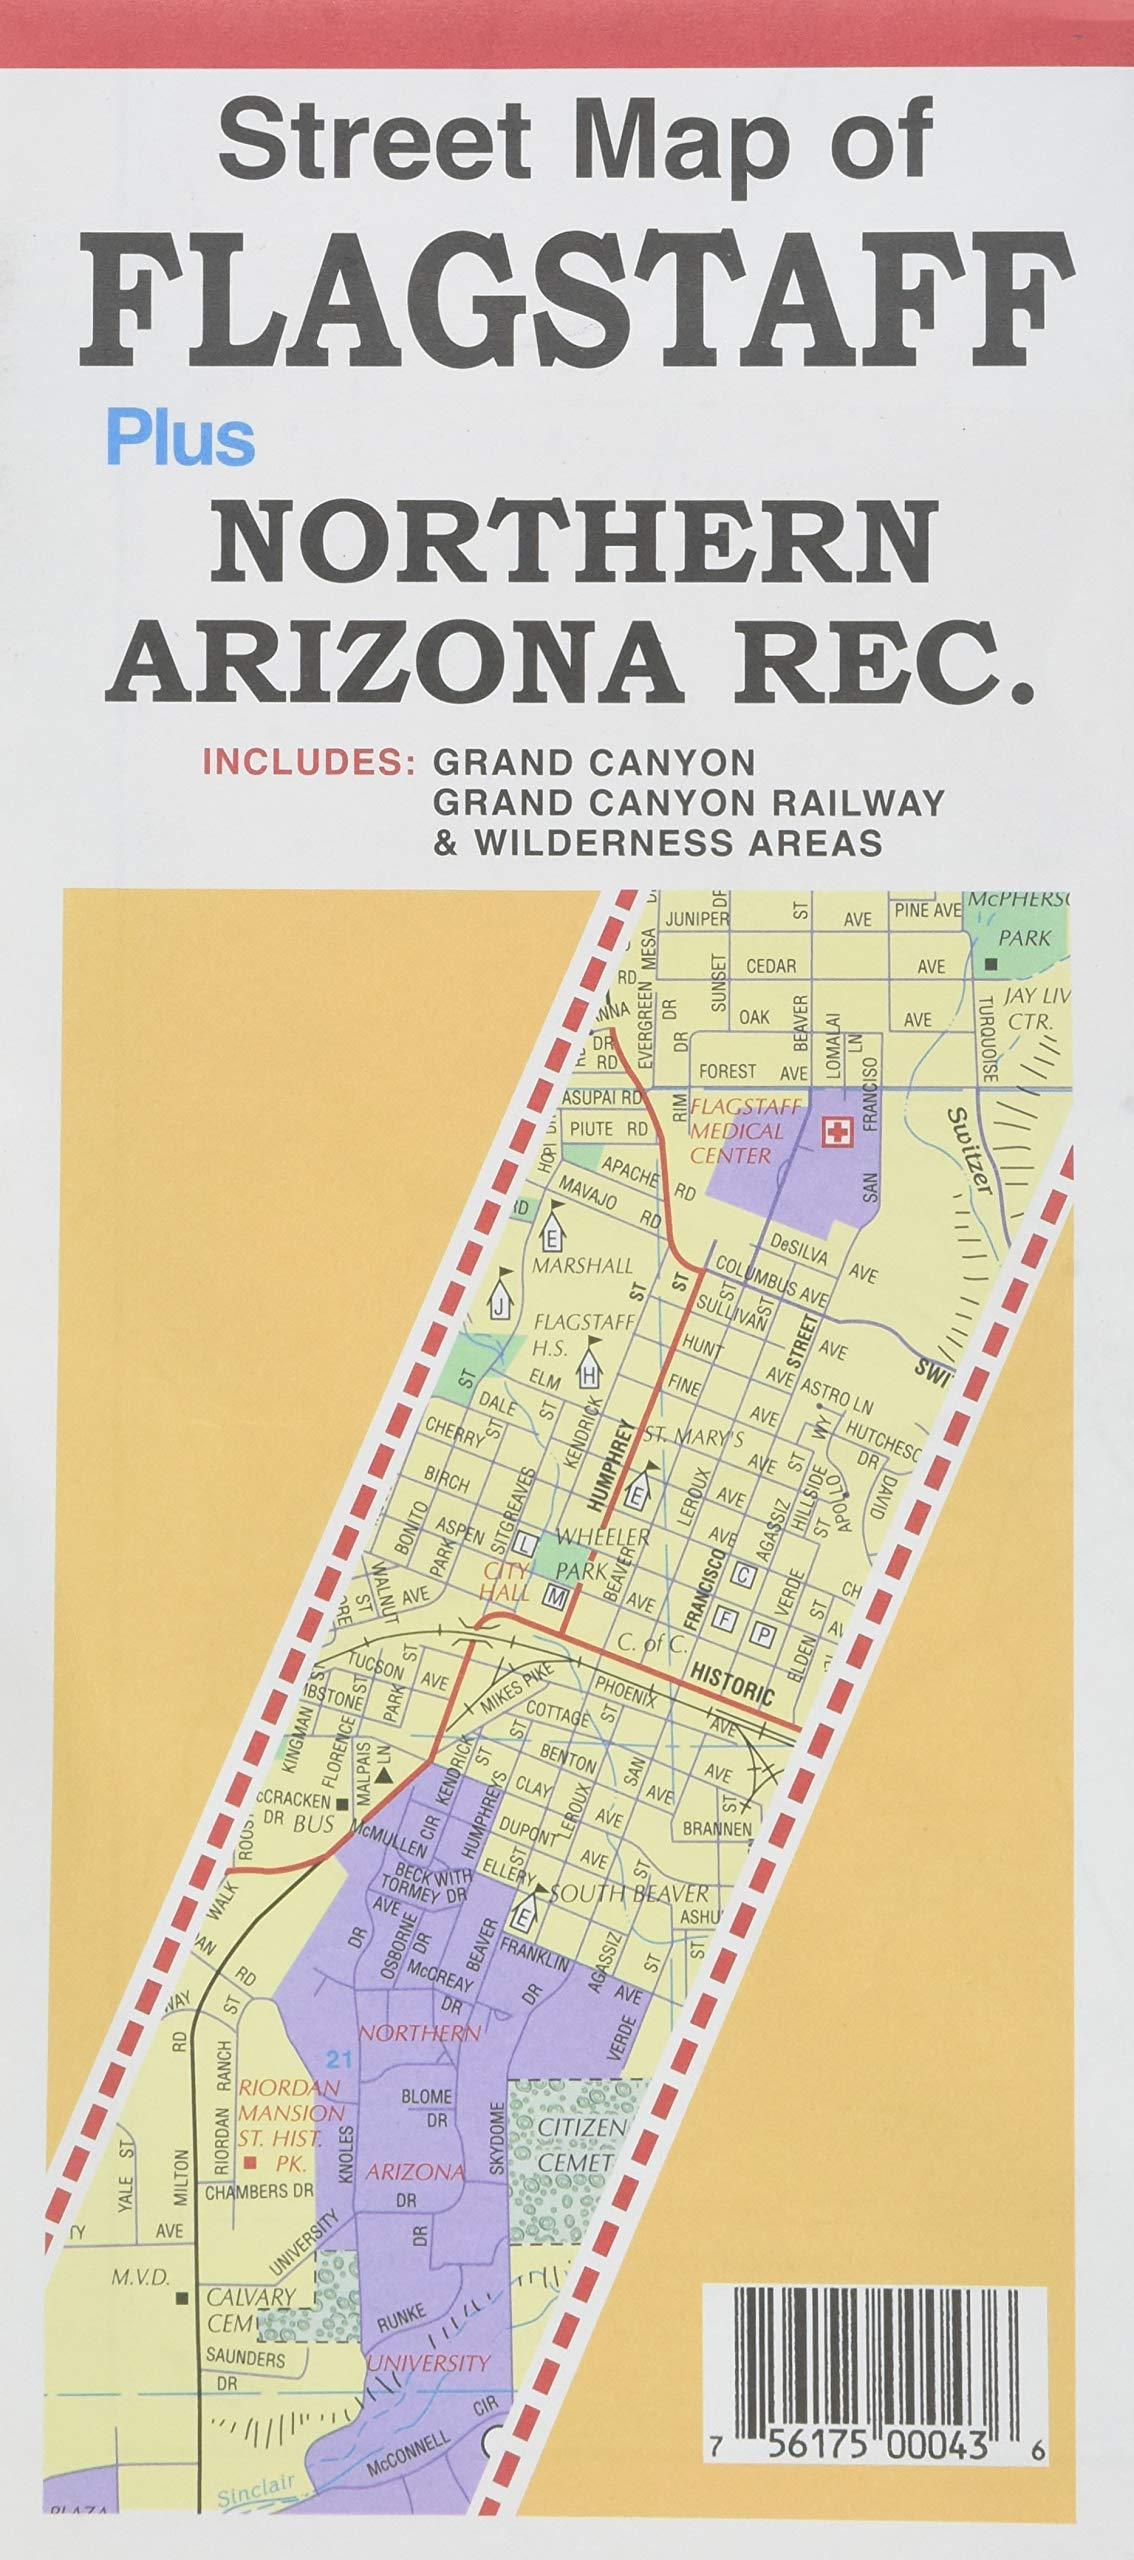 Map Of North Arizona.Street Map Of Flagstaff Plus Northern Arizona Rec North Star